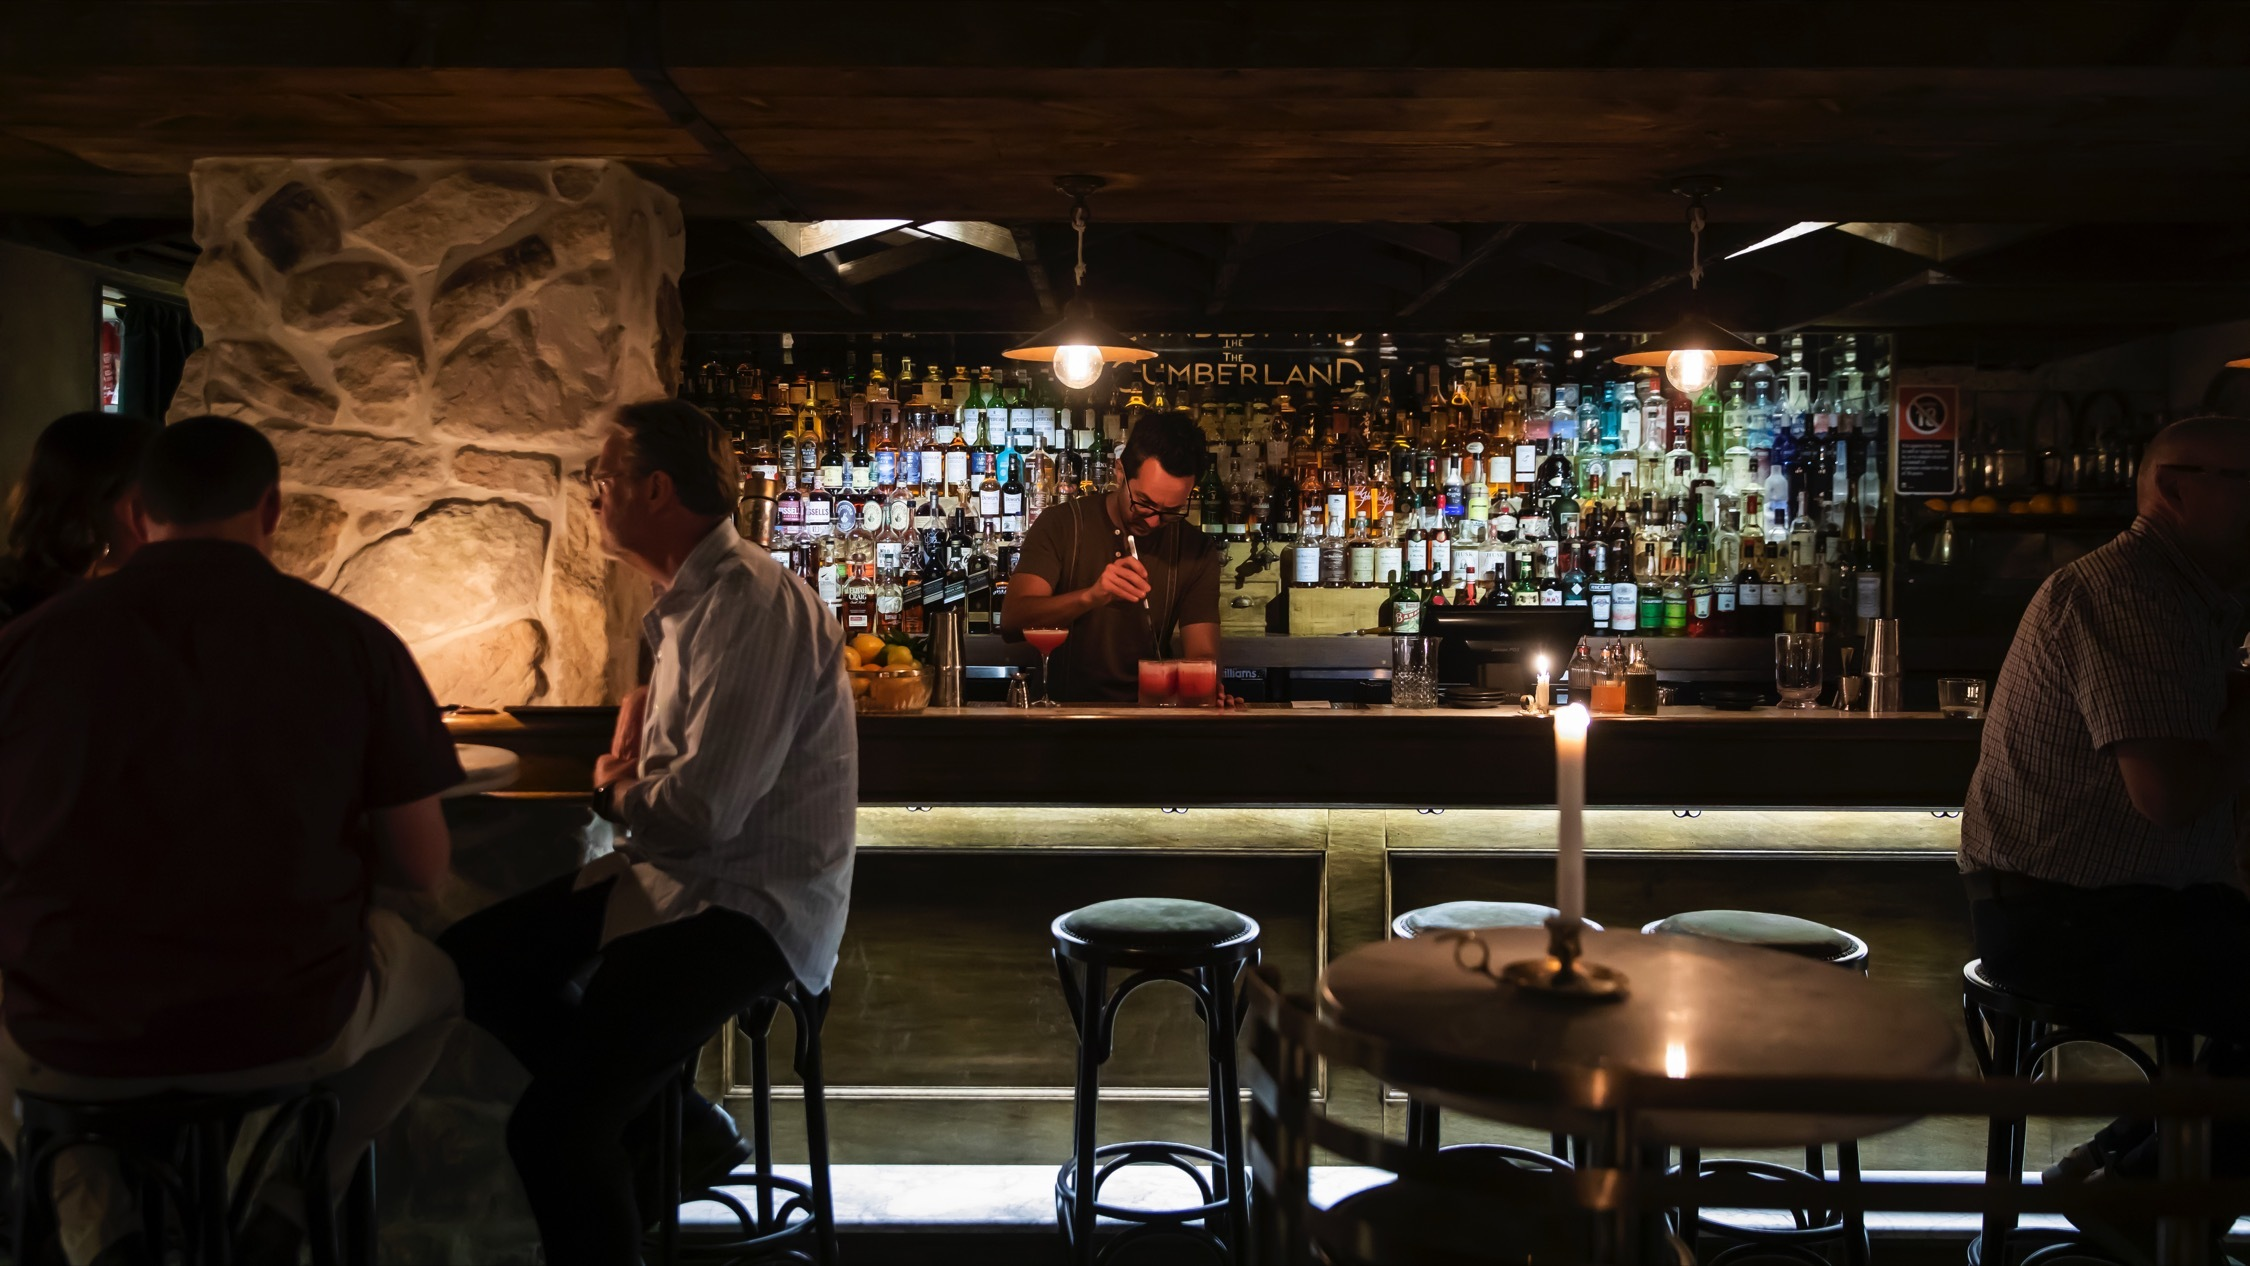 at The Cumberland Manly Bar